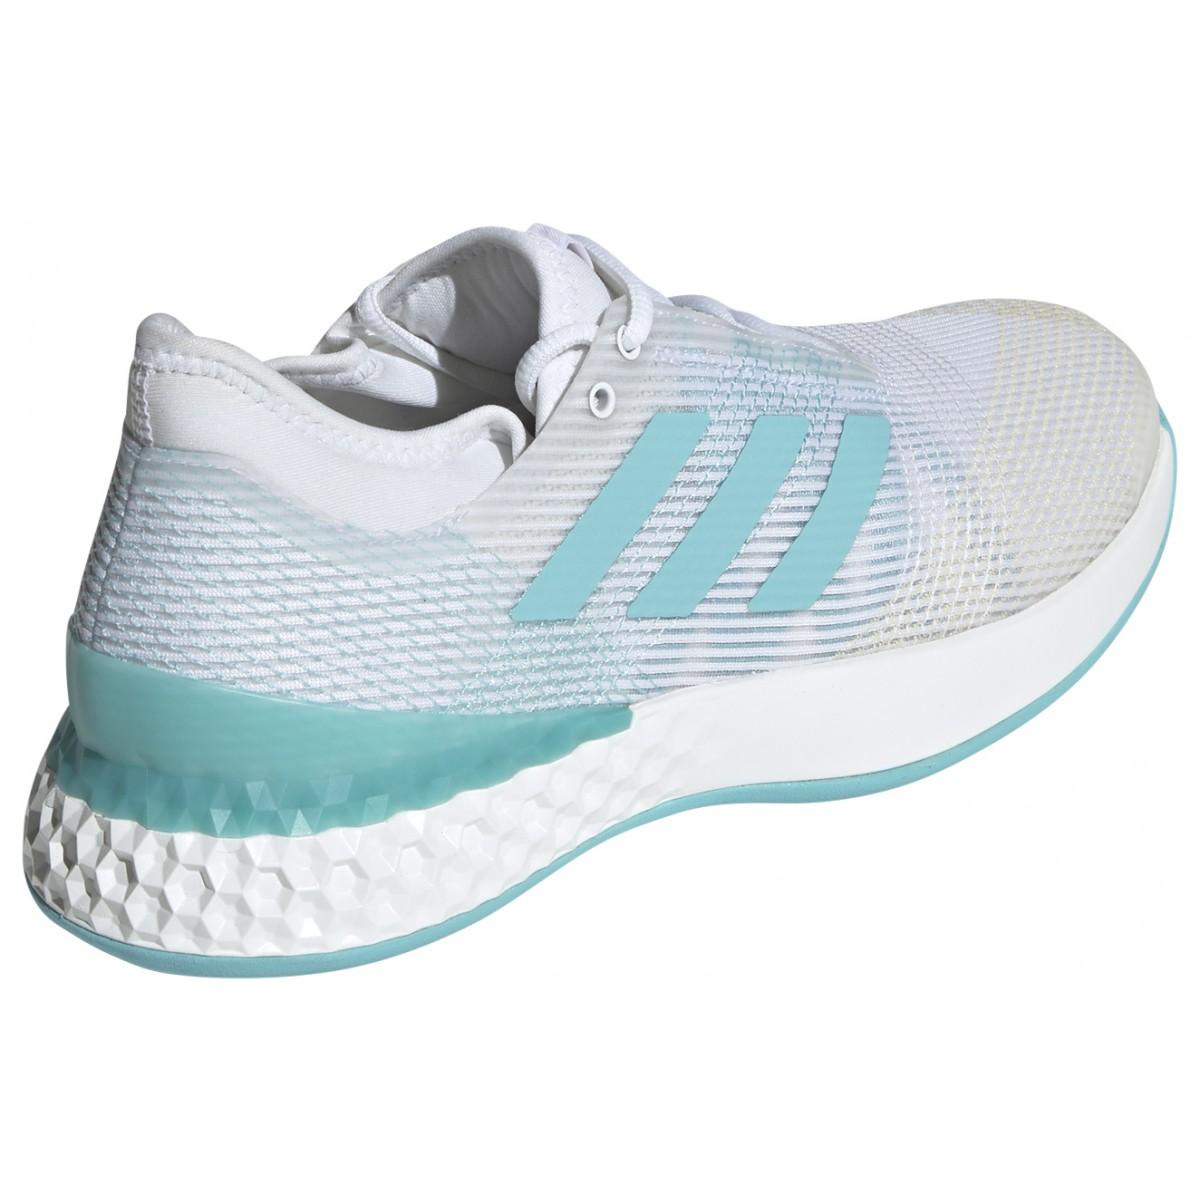 3 CatalogTennispro Scarpe Parley Adizero Adidas Ubersonic rxWdCoBe